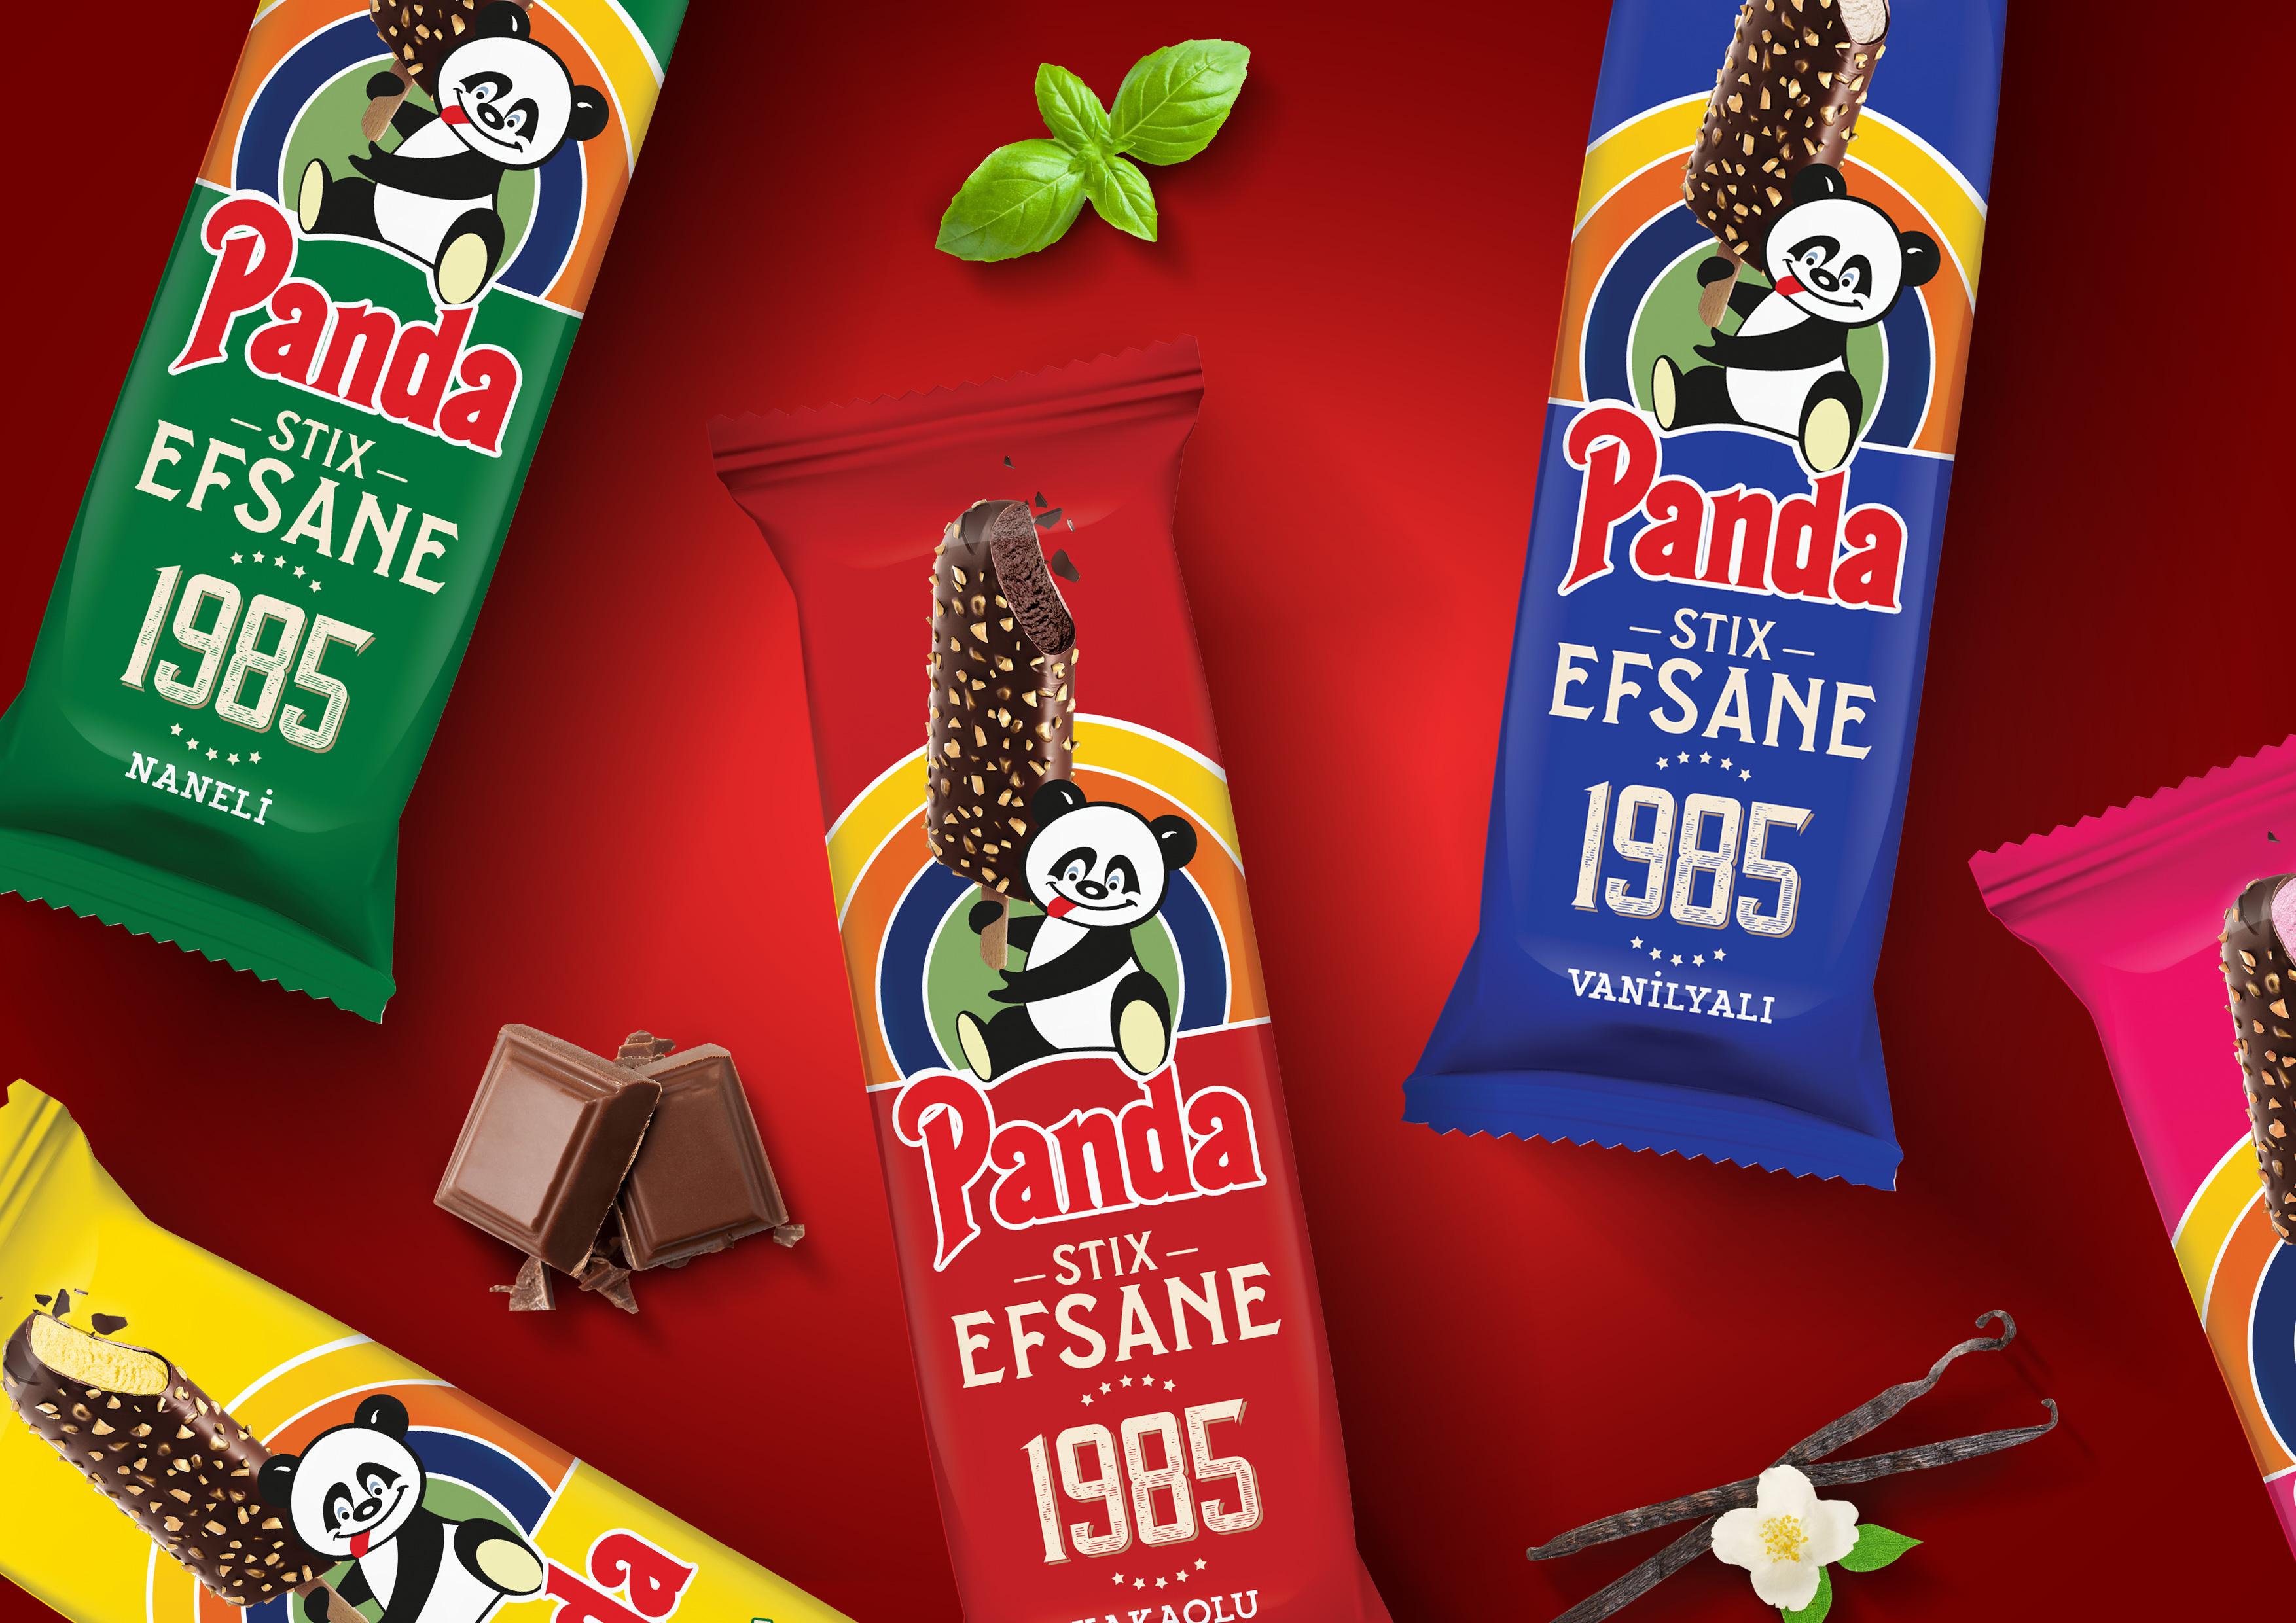 Panda Efsane Stix 1985